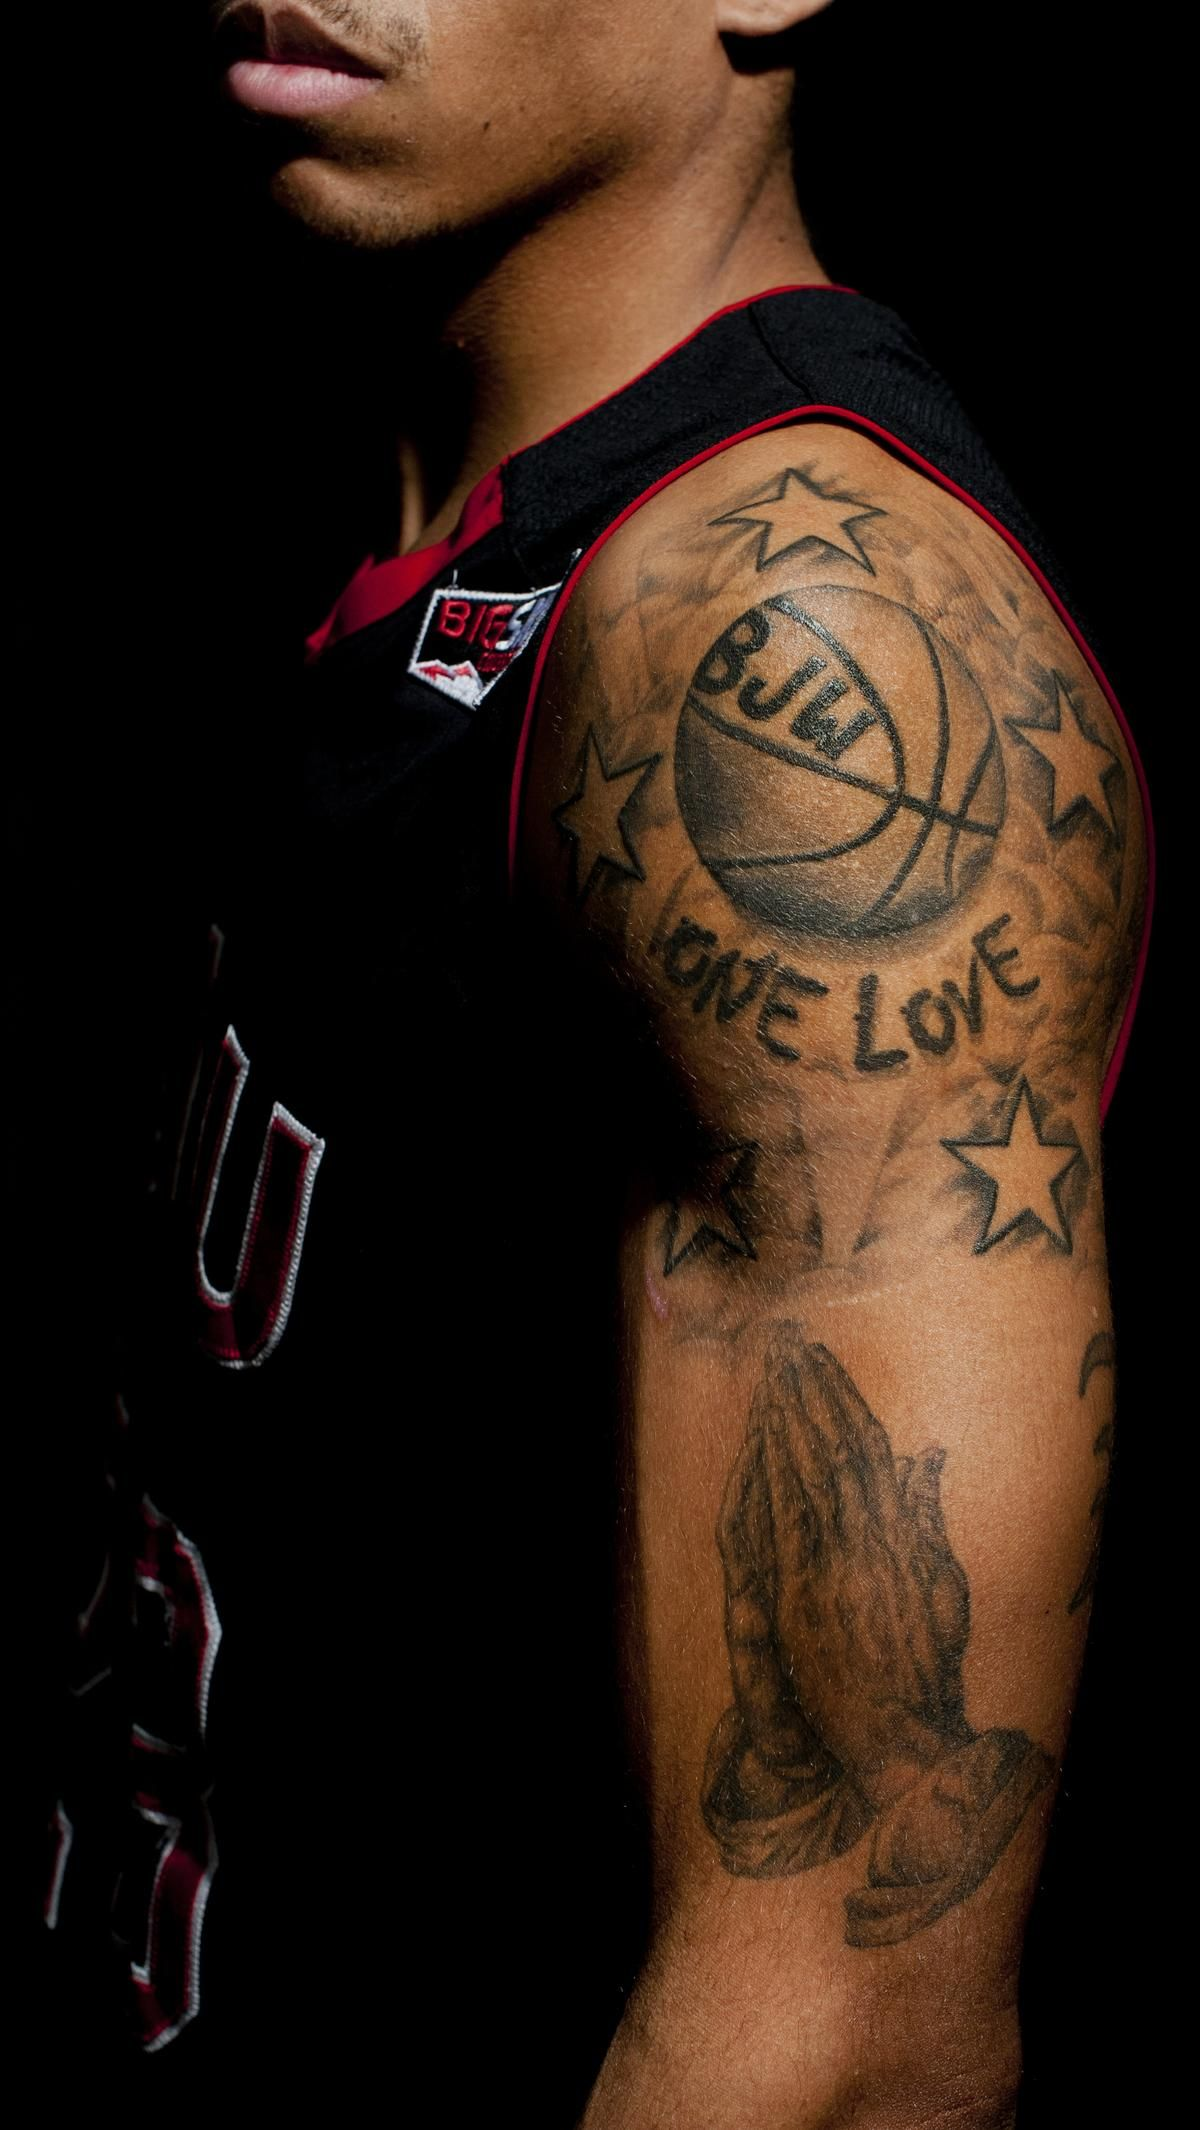 Basketball players' tattoos share lives, feelings